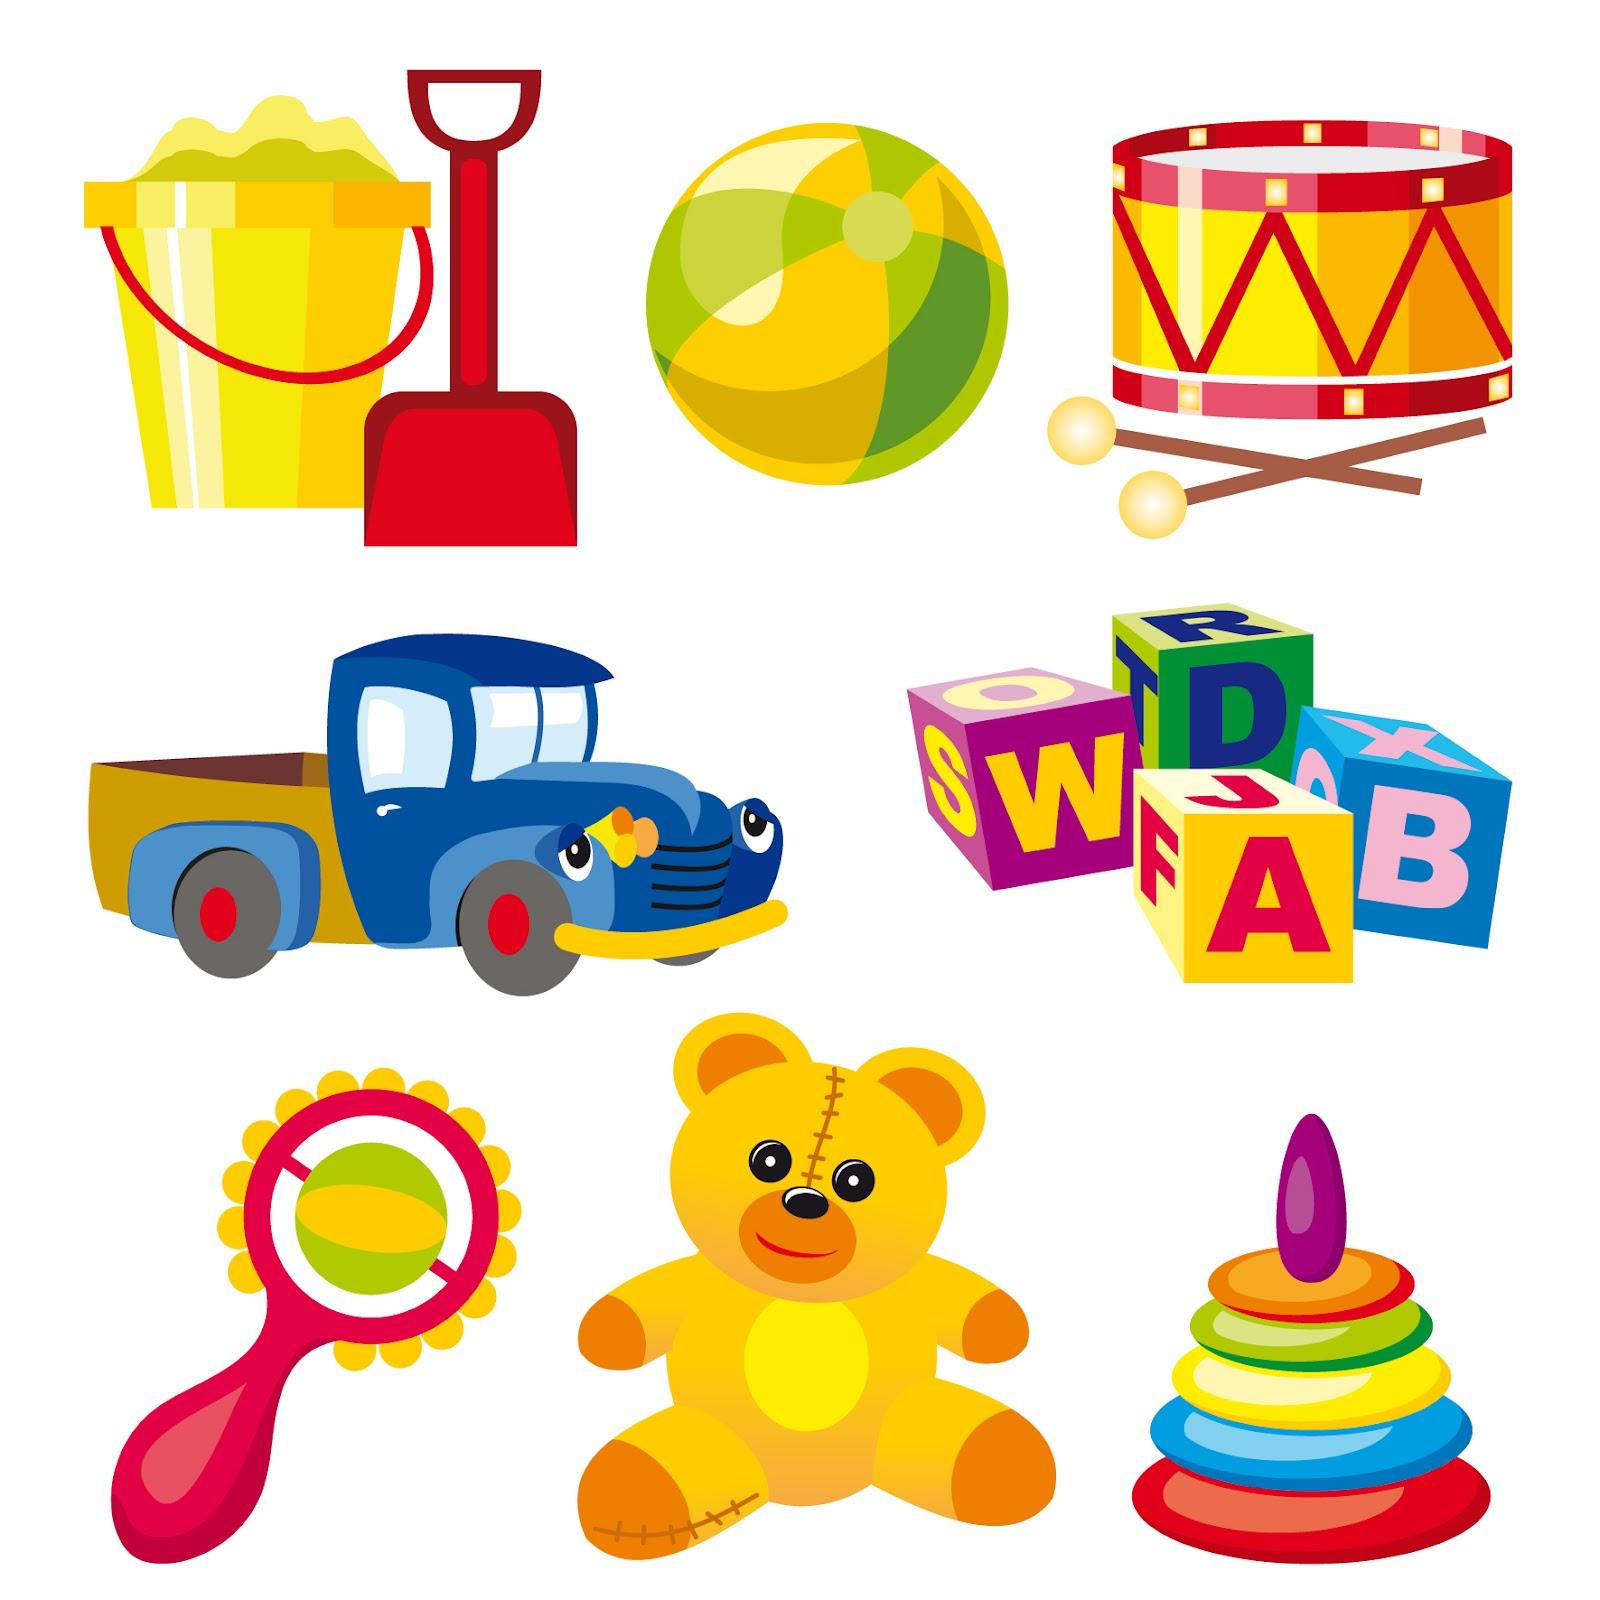 So ar con juguetes que significa - Cosas para guardar juguetes ...